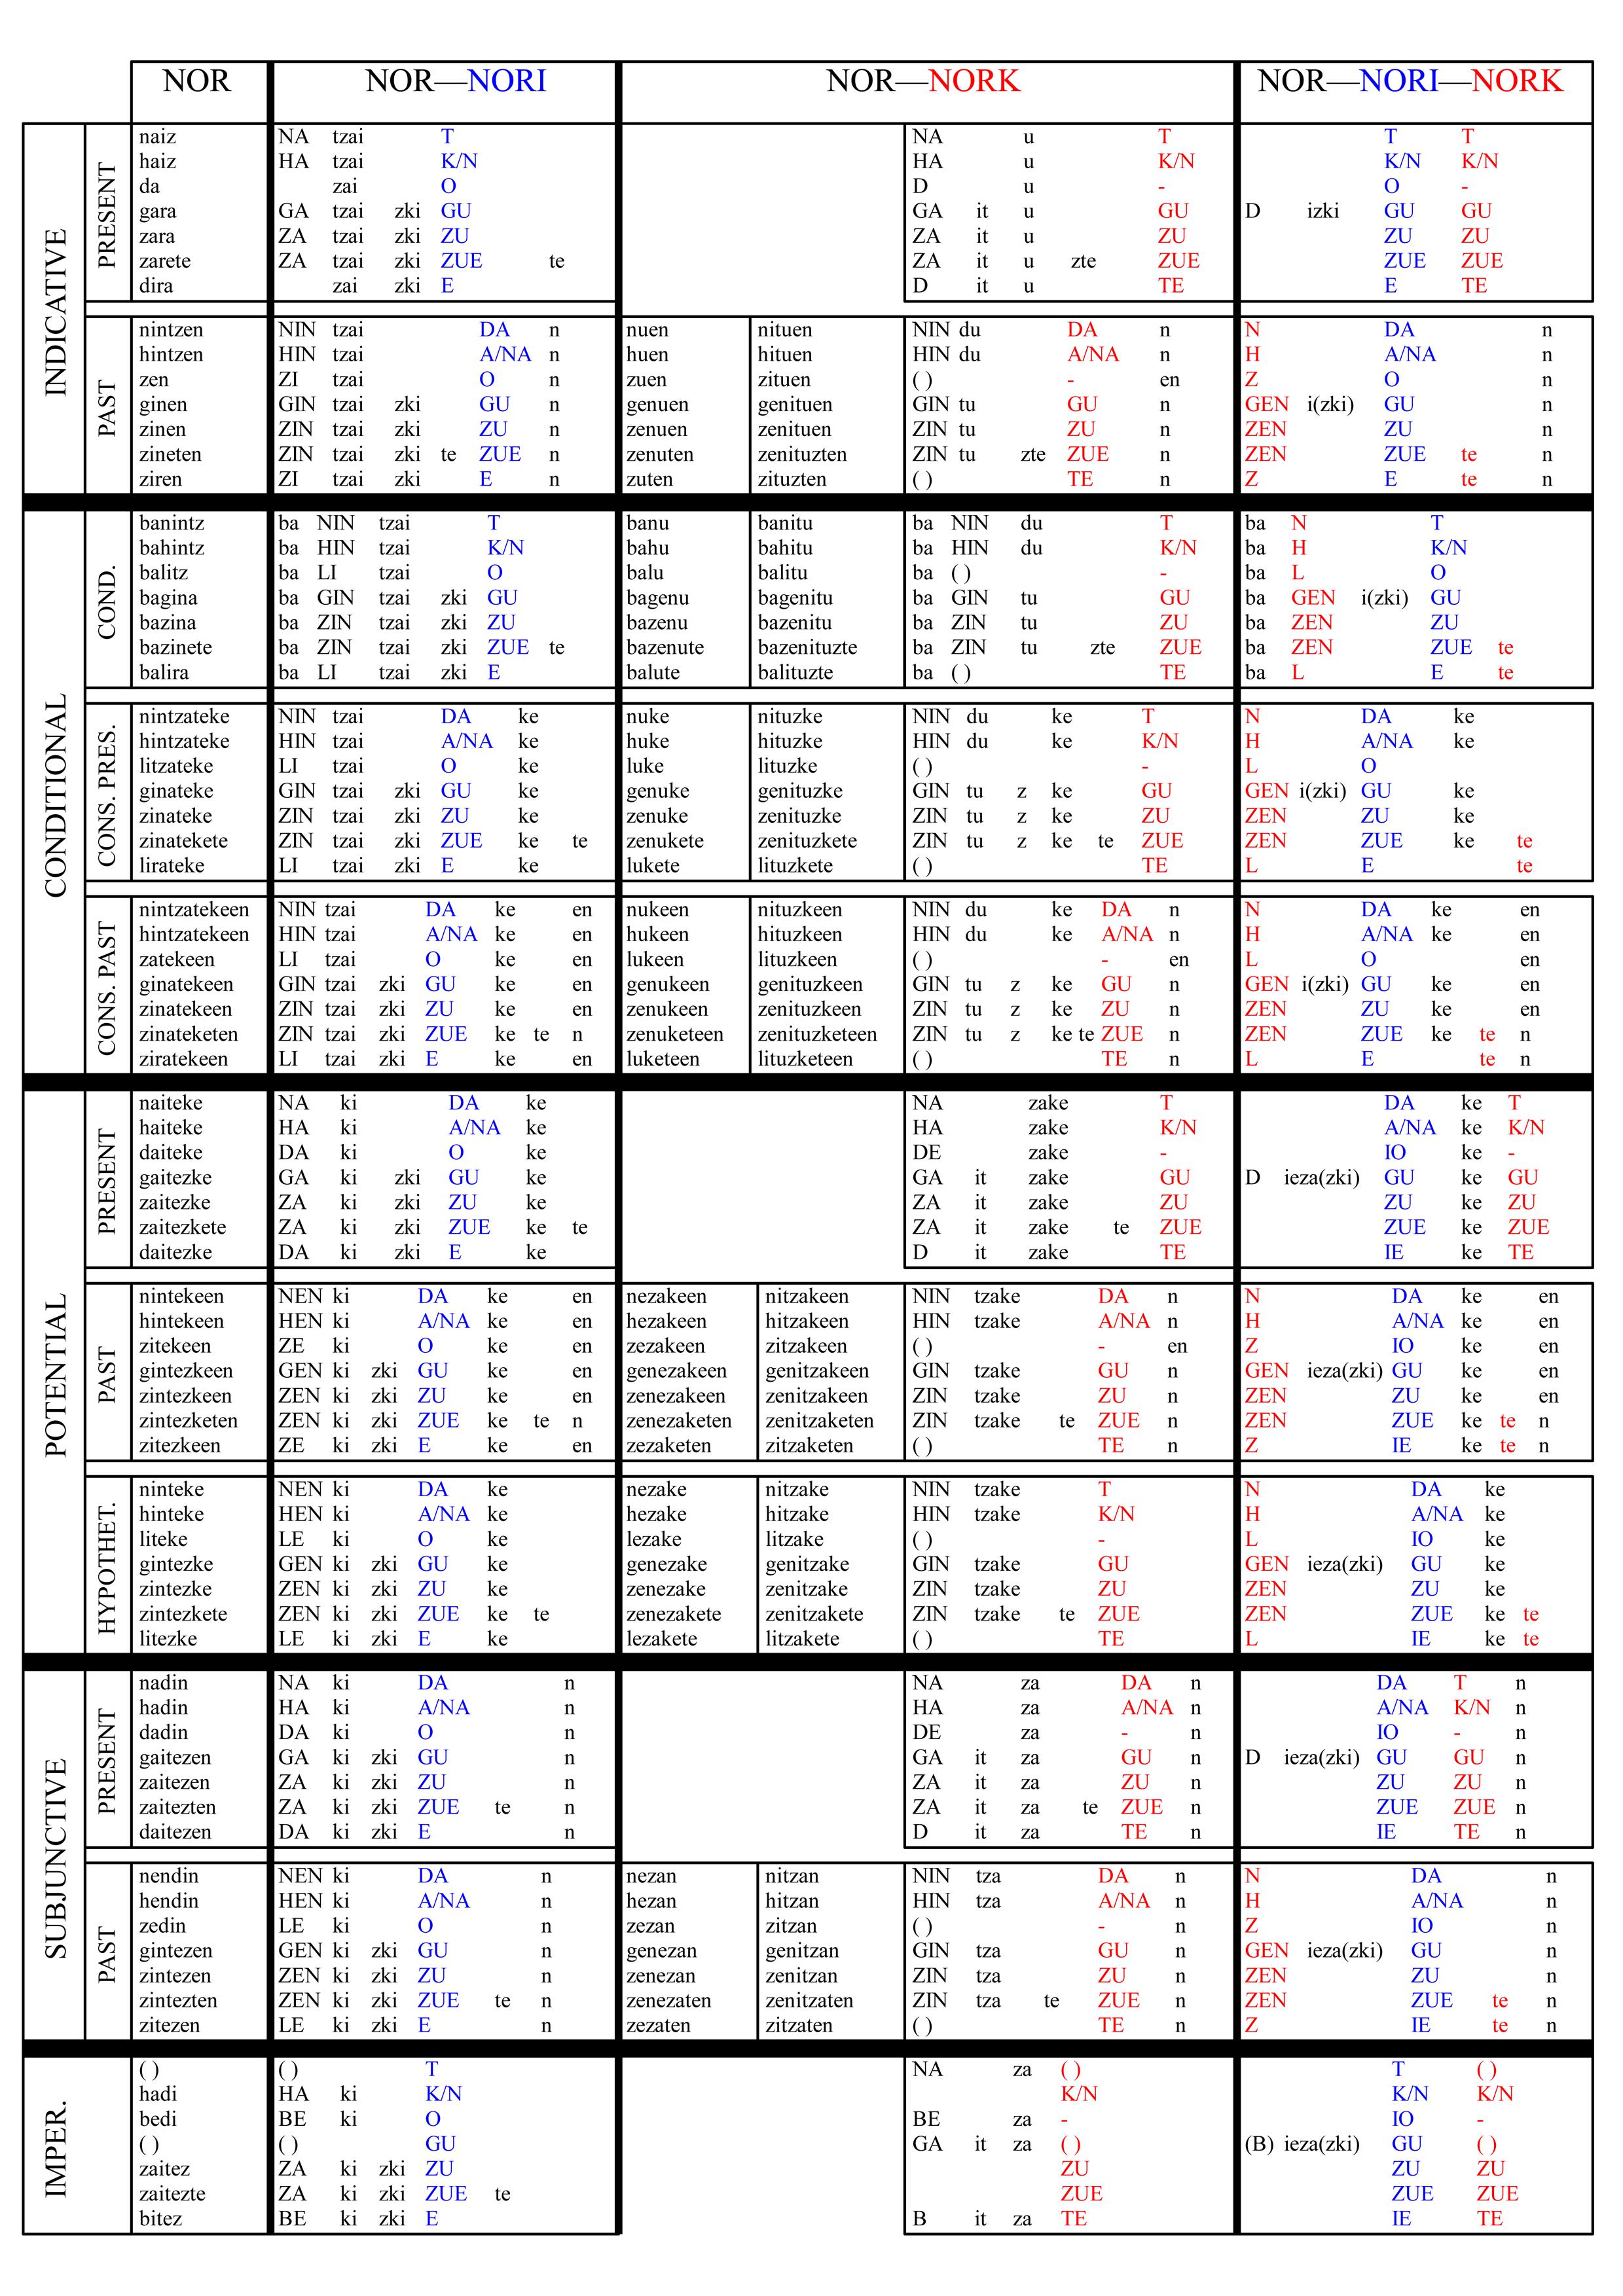 Fasciculus nor nori nork full vicipaedia for Table wikipedia